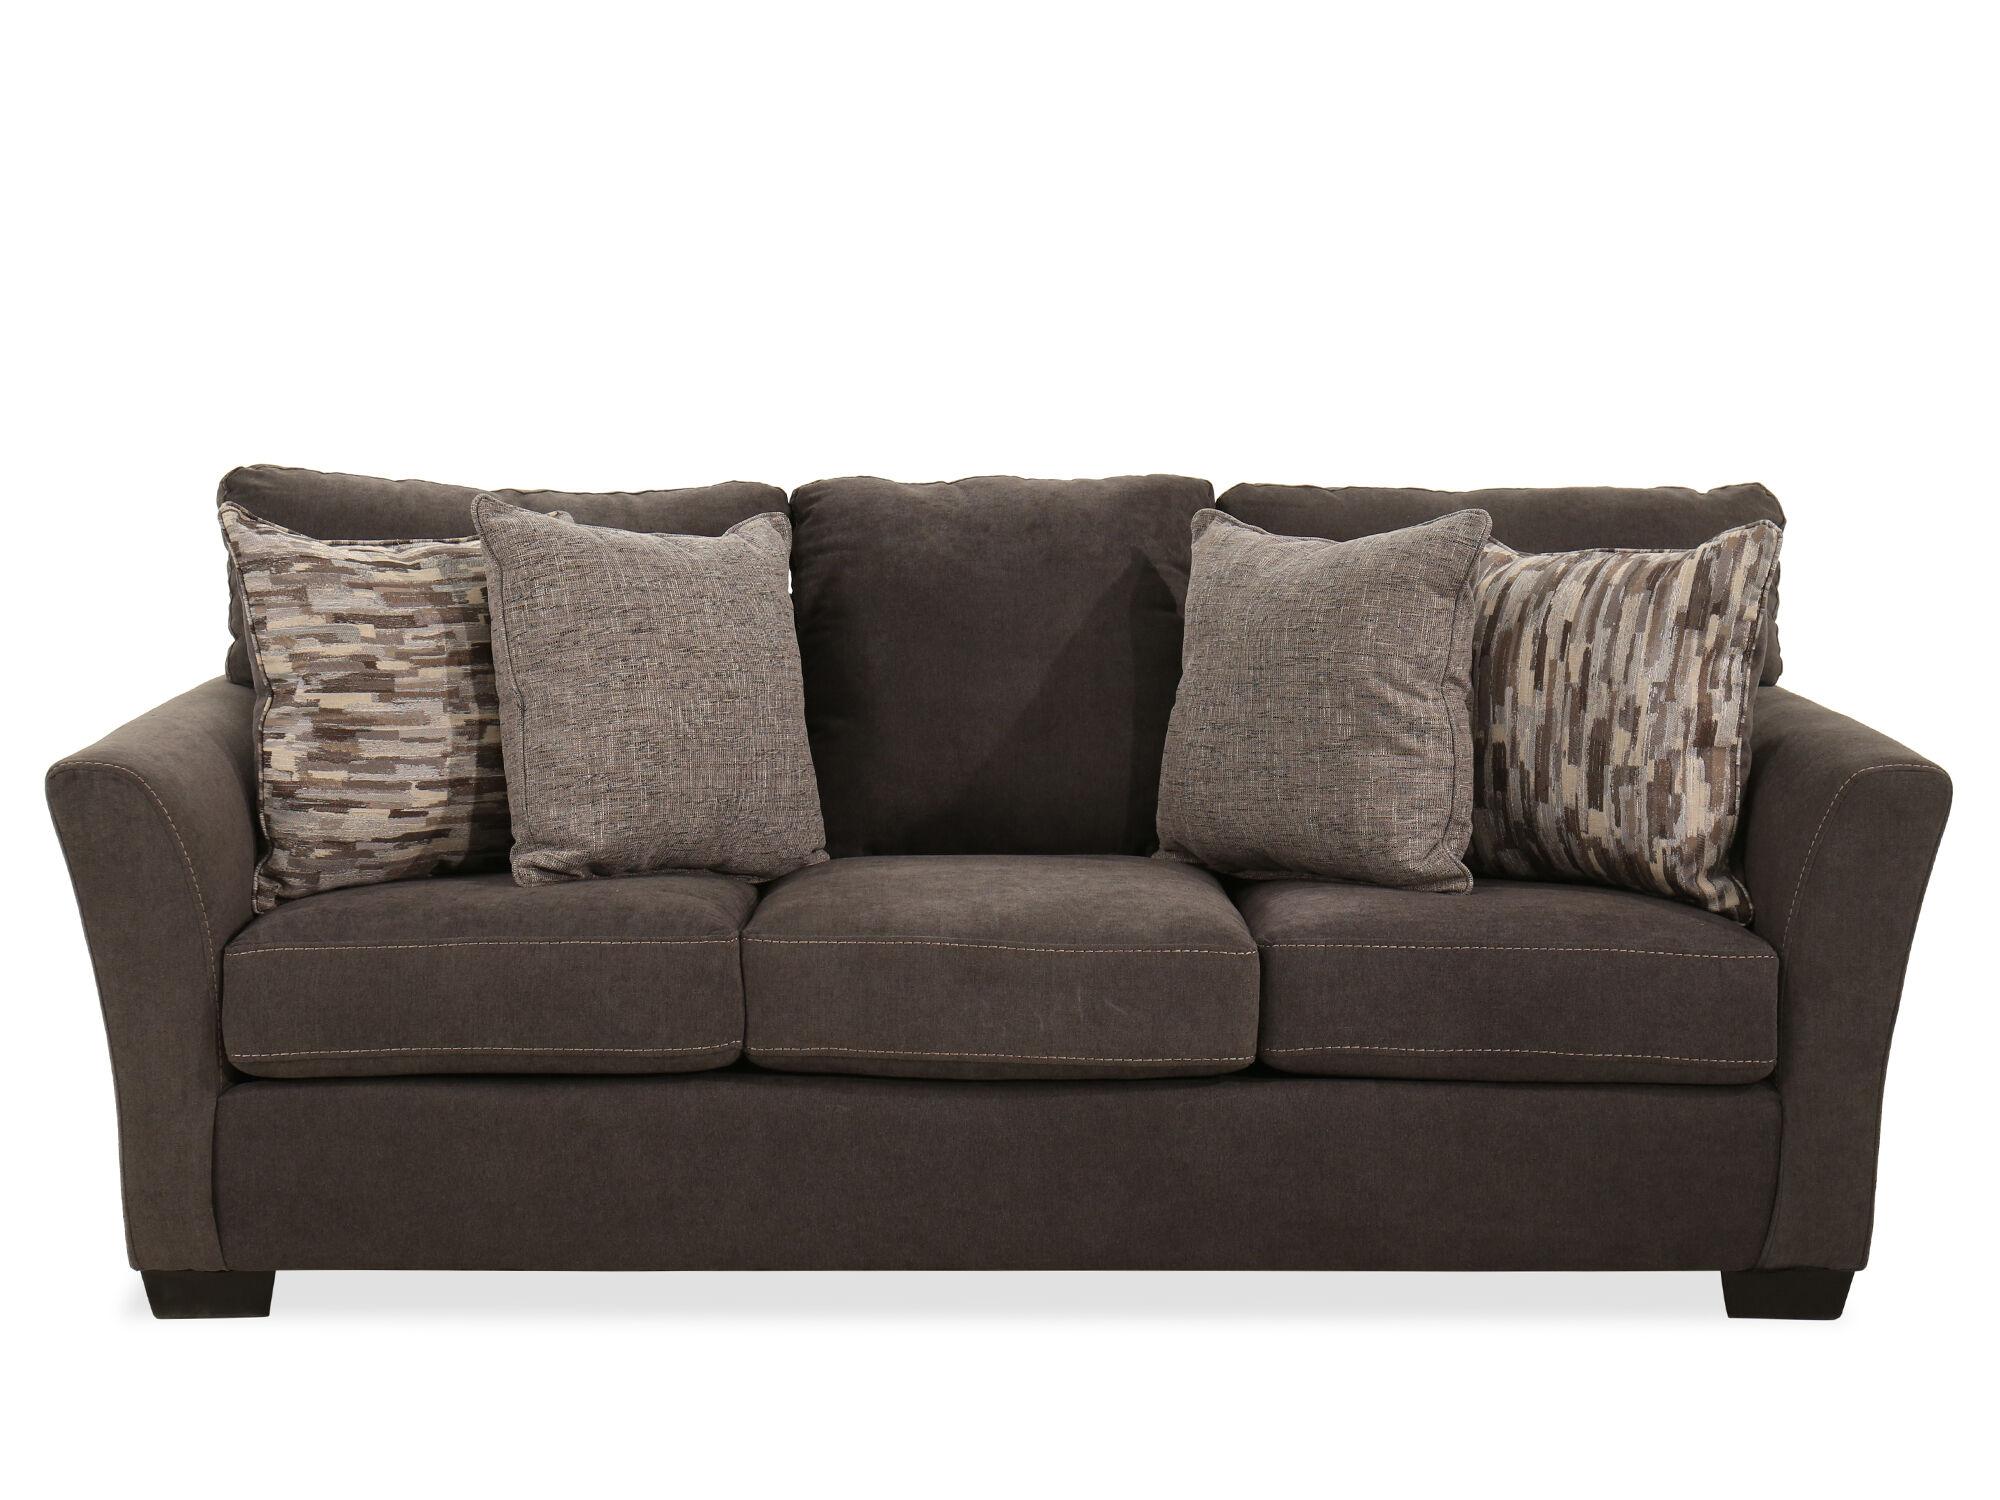 88u0026quot; Transitional Sofa ...